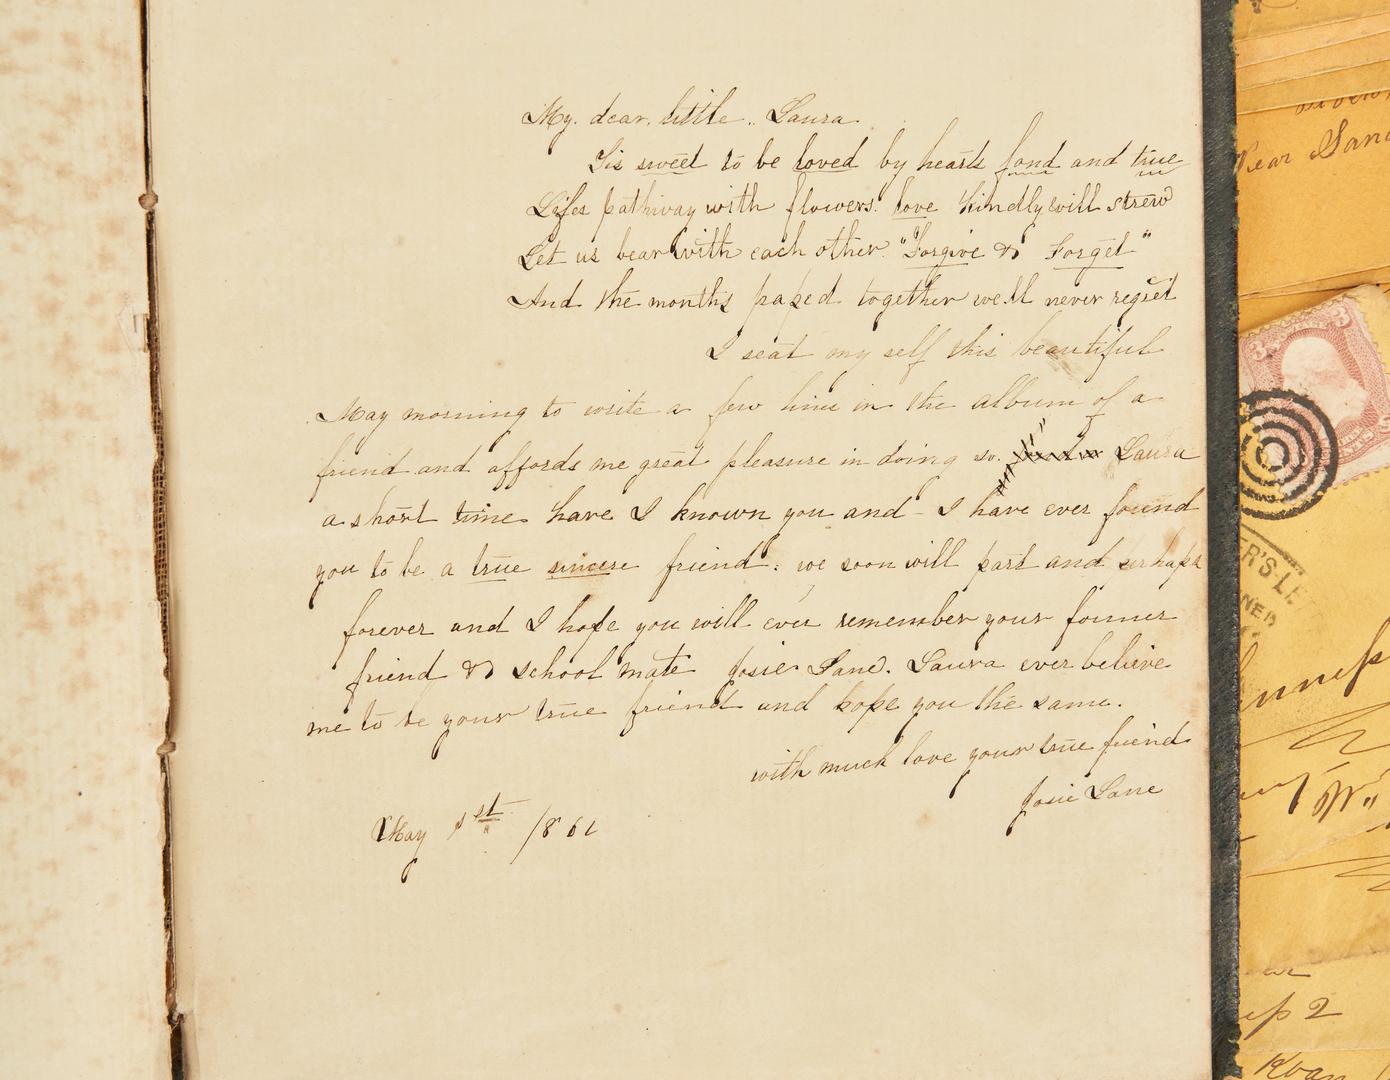 Lot 611: 63 Civil War ephemera items, incl. Soldier Ambrotype, Autograph Album, Johnson's Island Envelopes